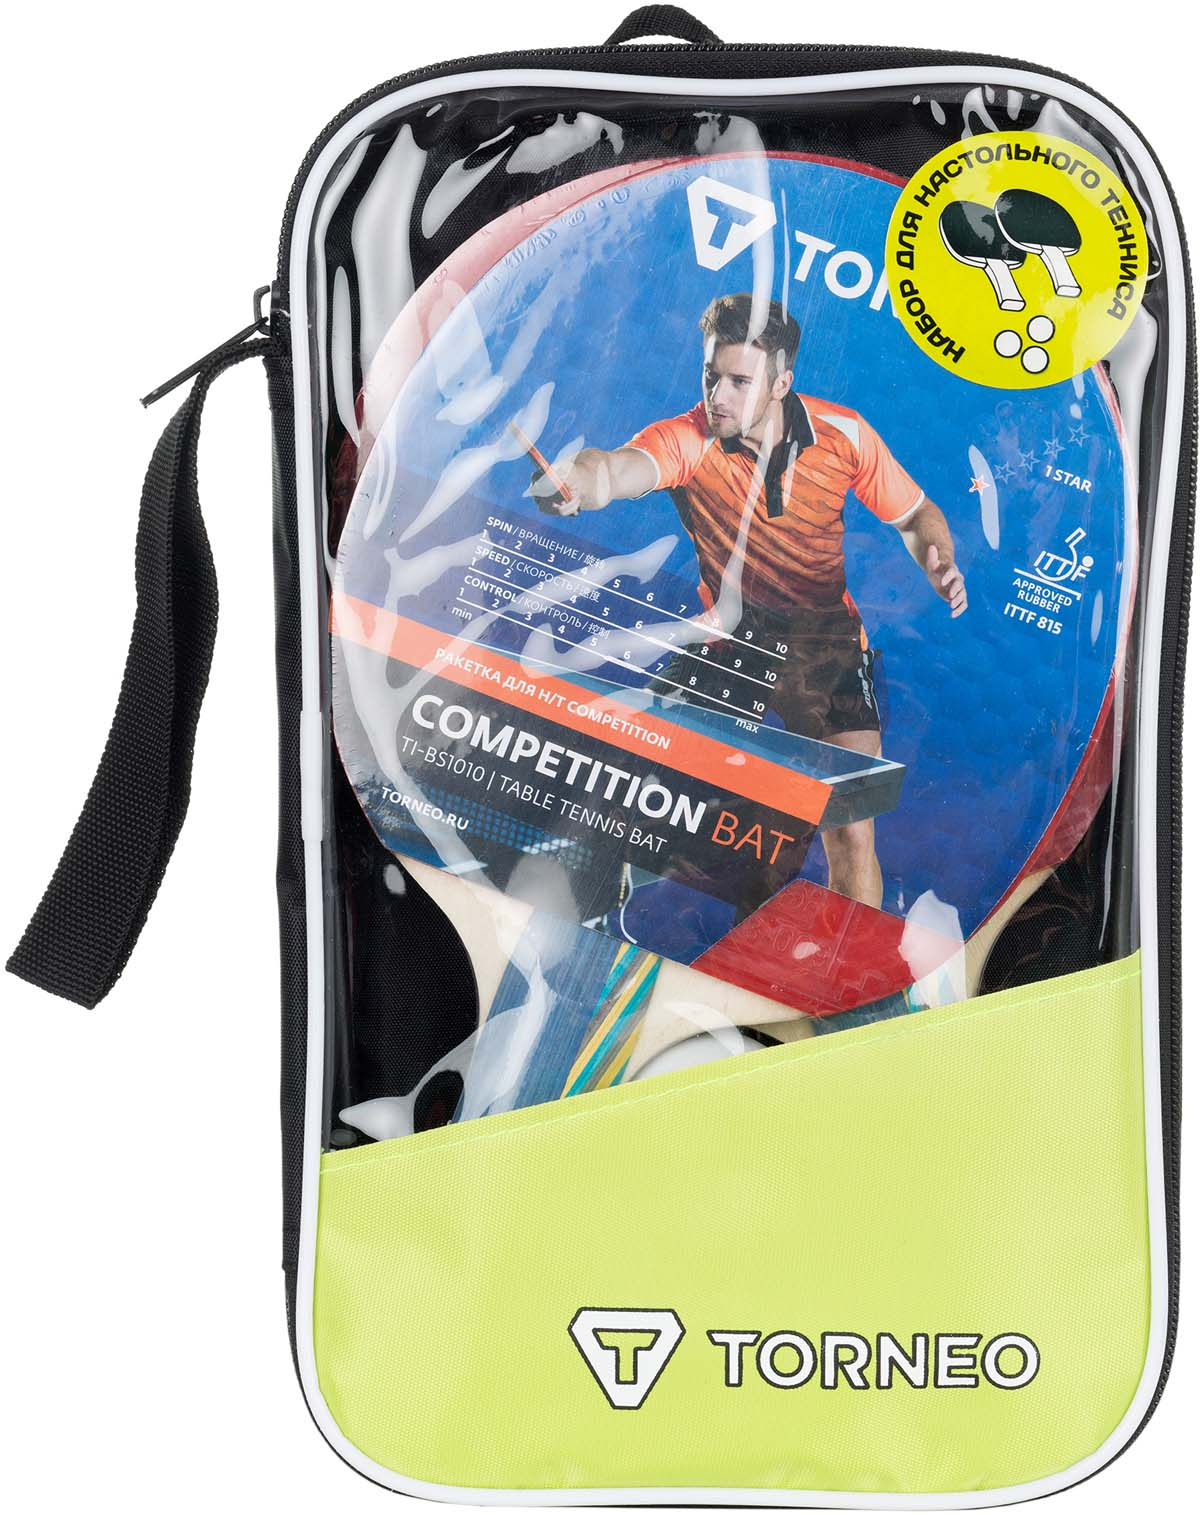 Набор для настольного тенниса Torneo, 6 предметов. TI-BS1010